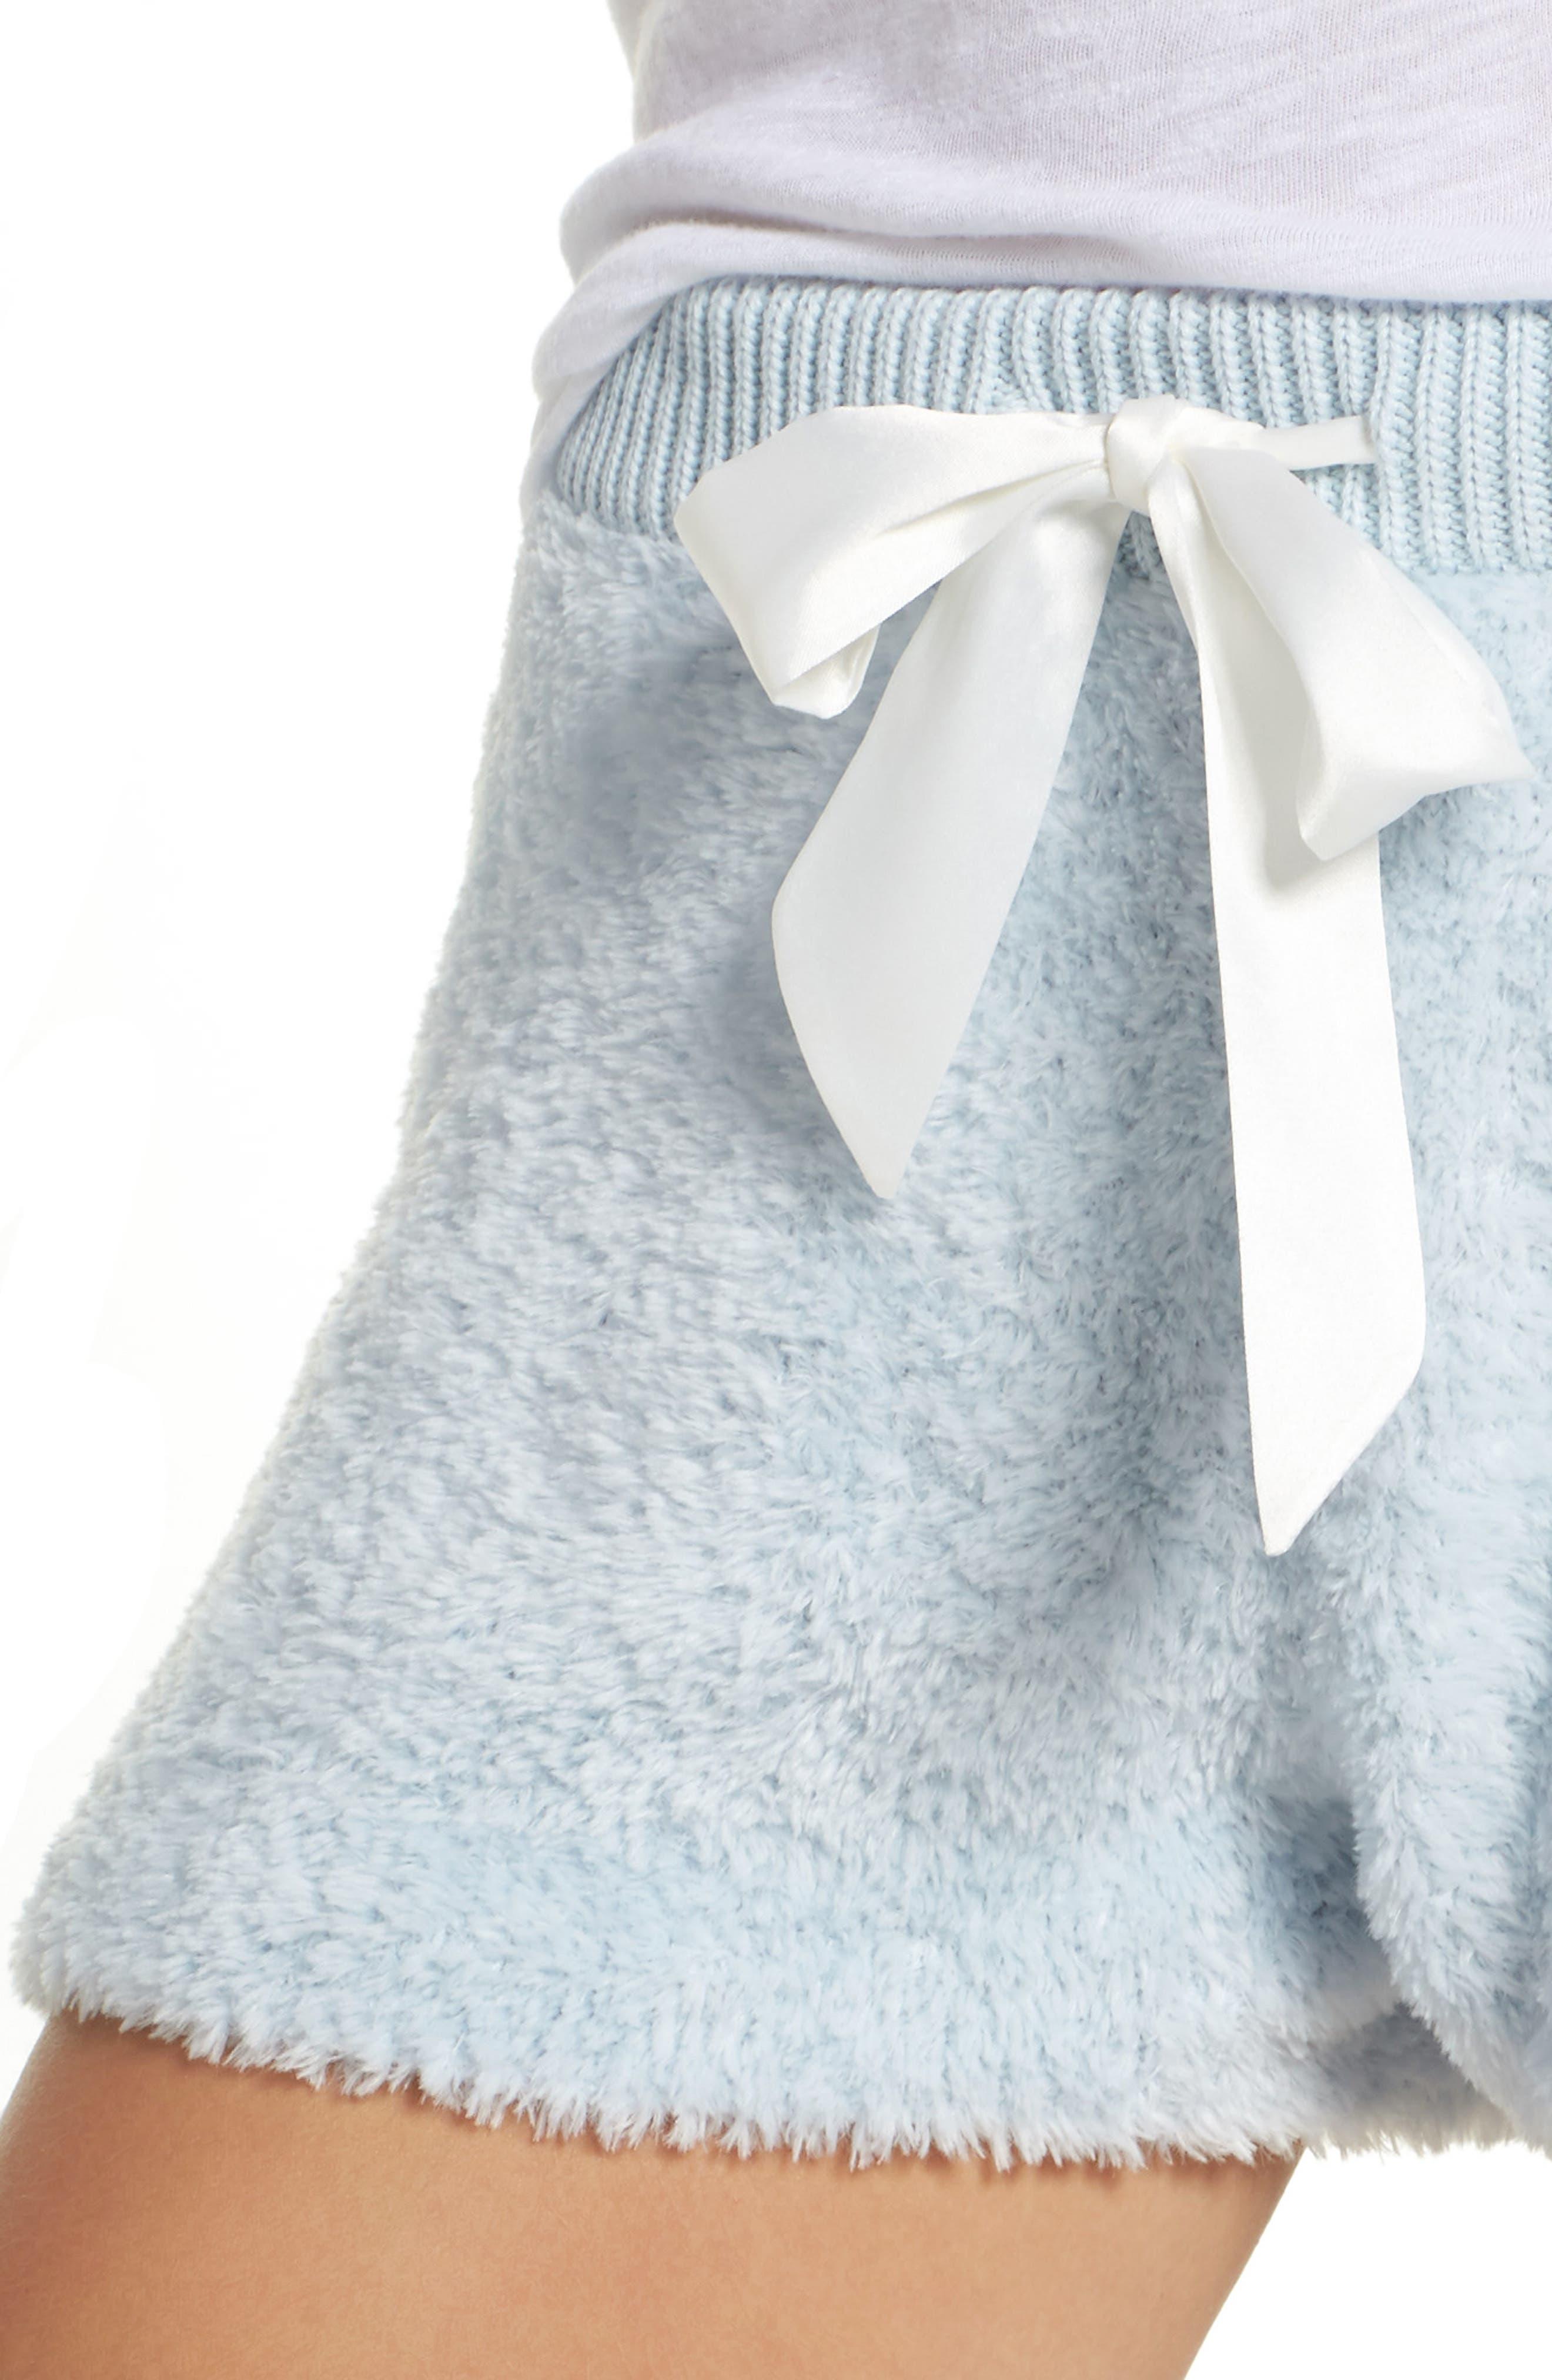 Fuzzy Lounge Shorts,                             Alternate thumbnail 6, color,                             Blue Drift